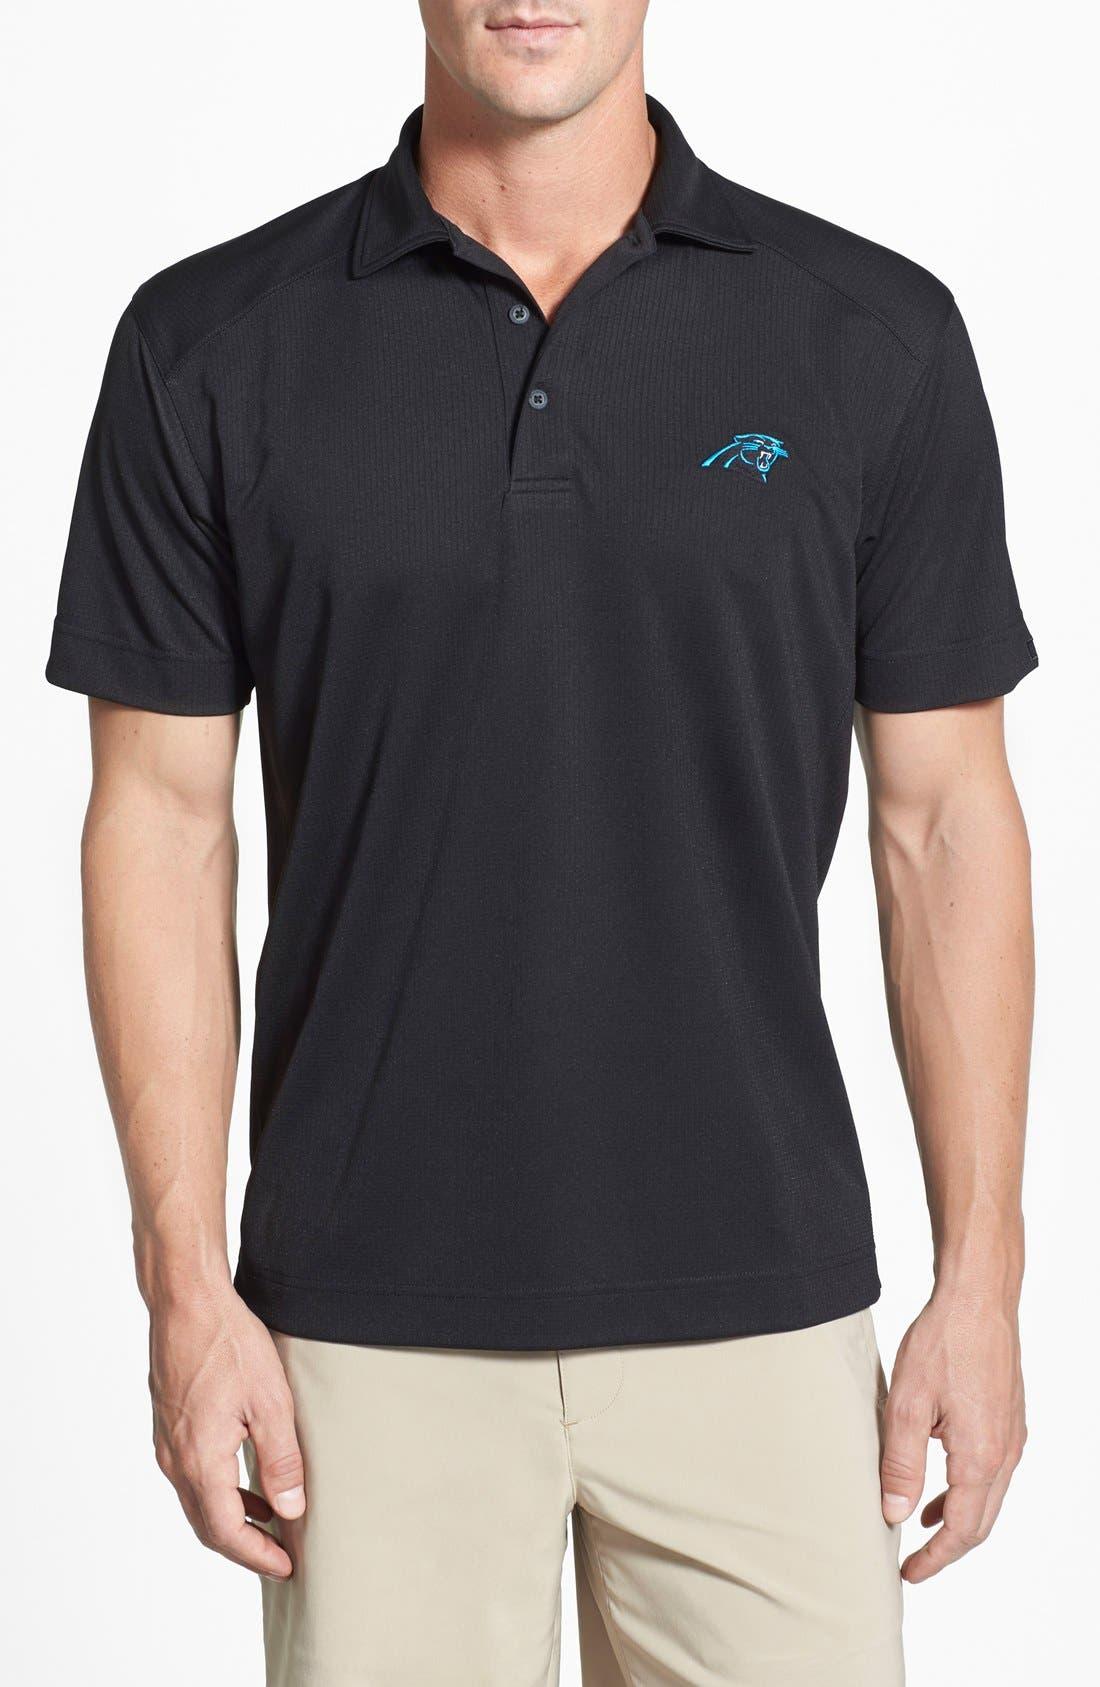 Carolina Panthers - Genre DryTec Moisture Wicking Polo,                         Main,                         color, Black